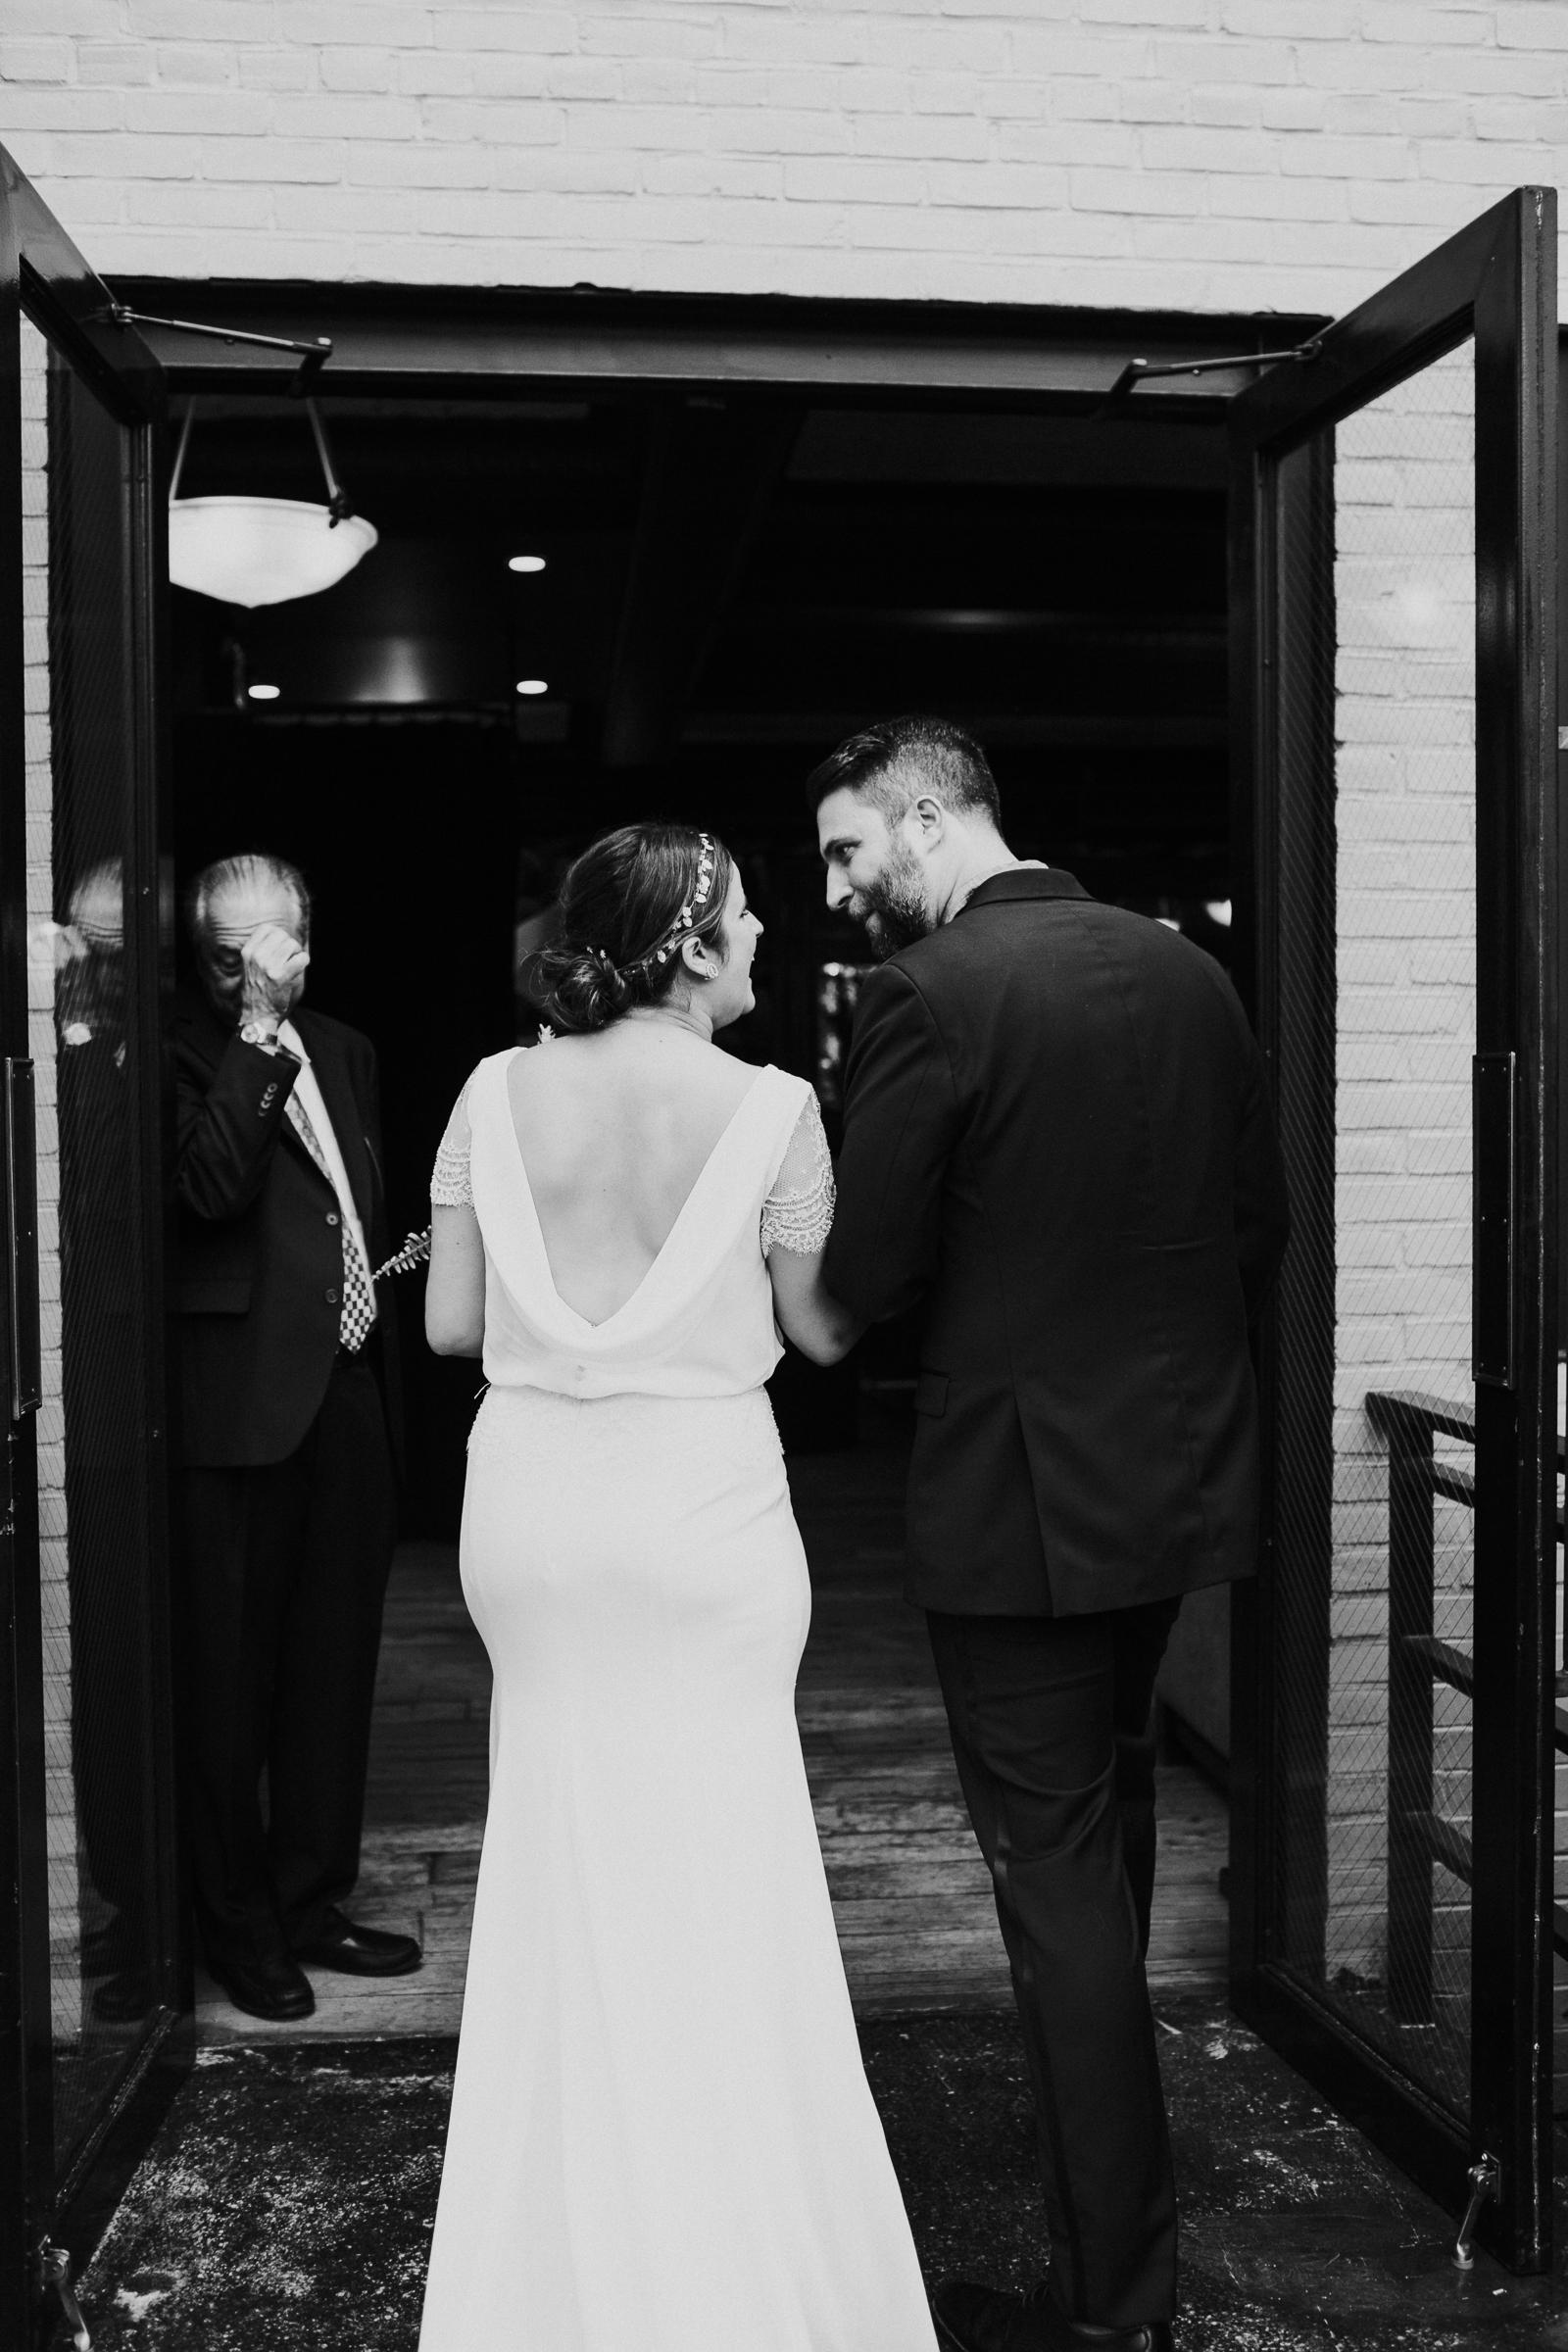 501-Union-Brooklyn-Fine-Art-Documentary-Wedding-Photographer-94.jpg